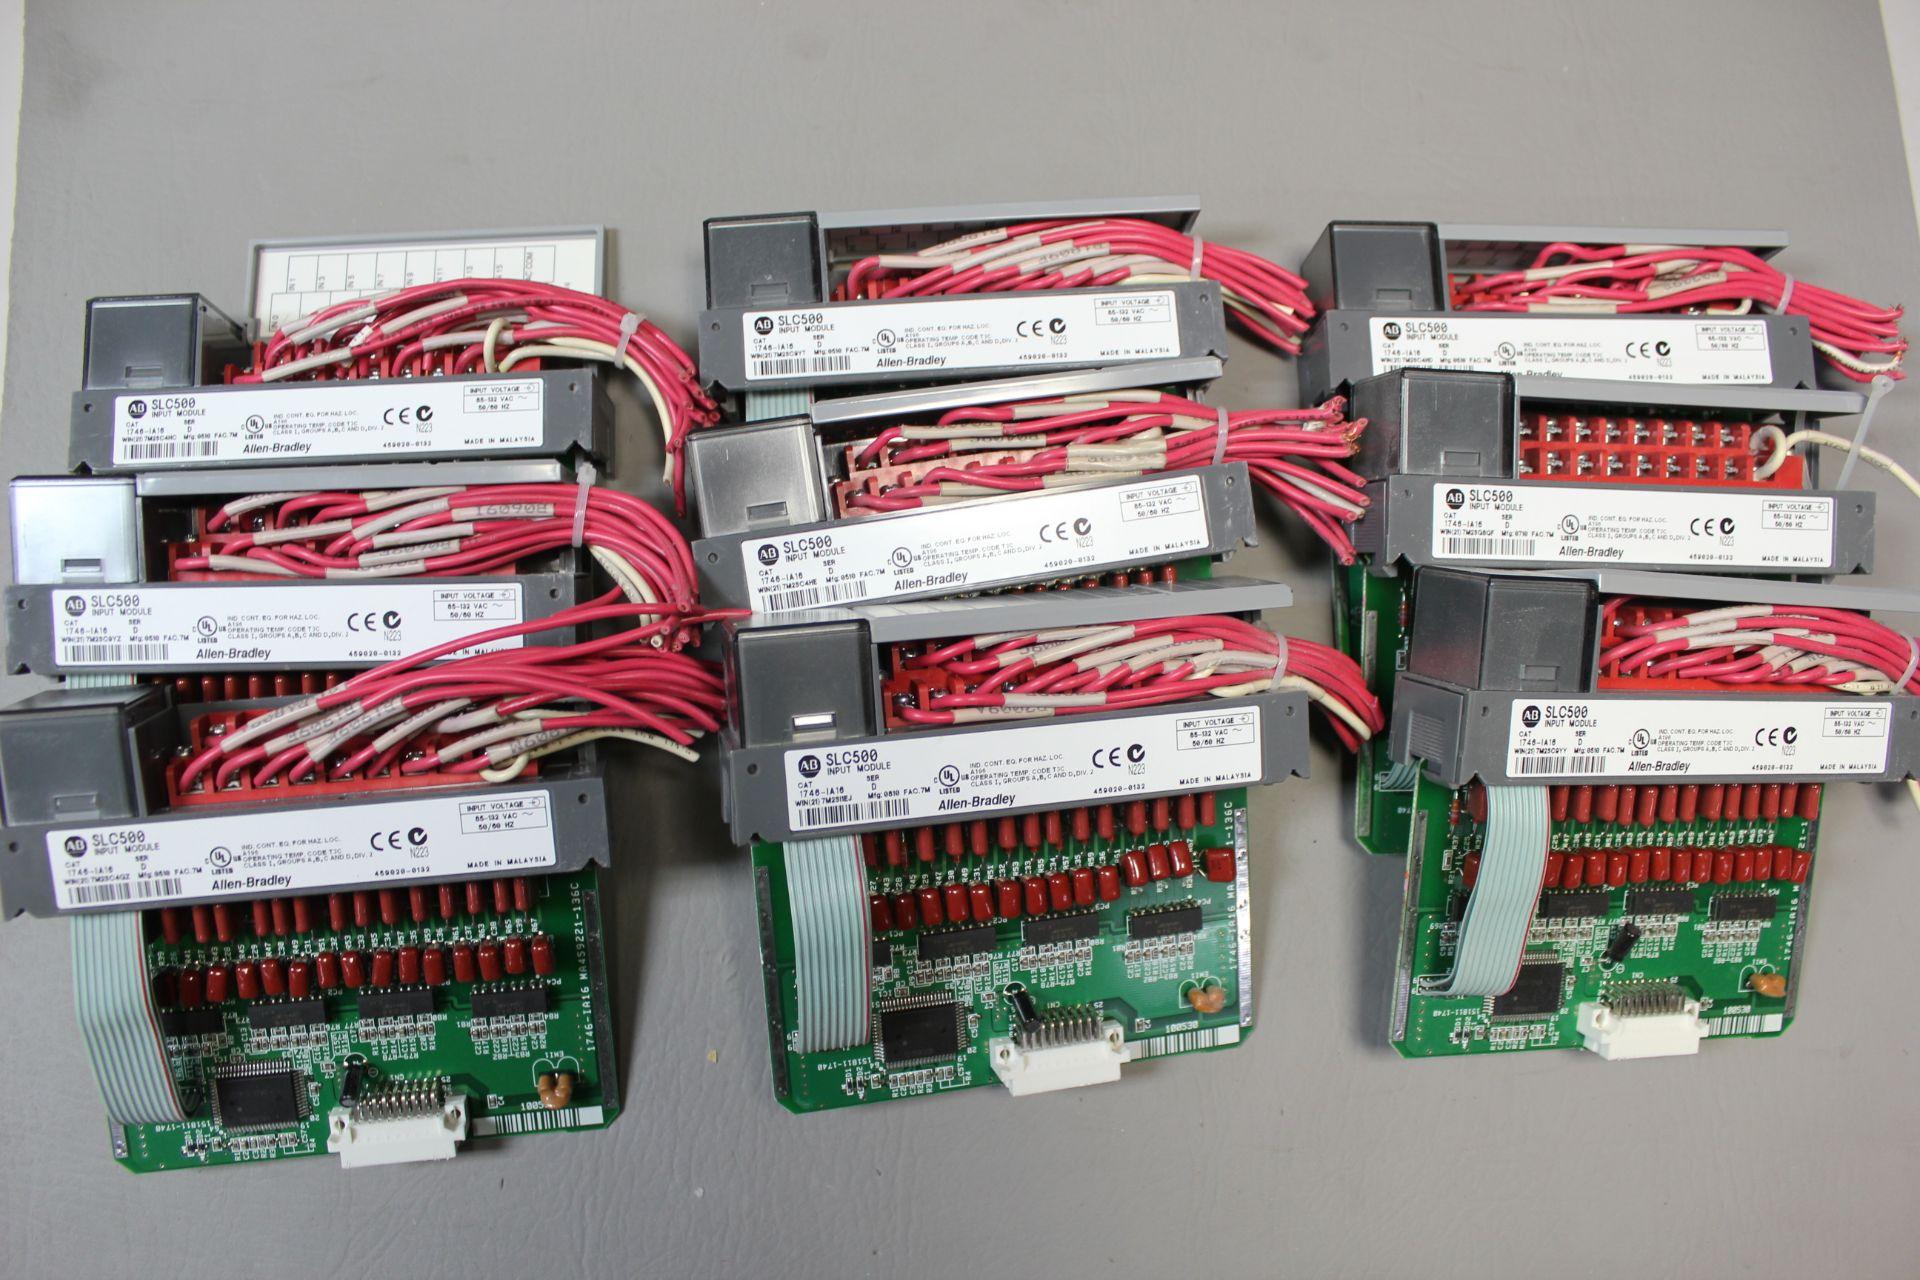 LOT OF ALLEN BRADLEY PLC MODULES - Image 2 of 5